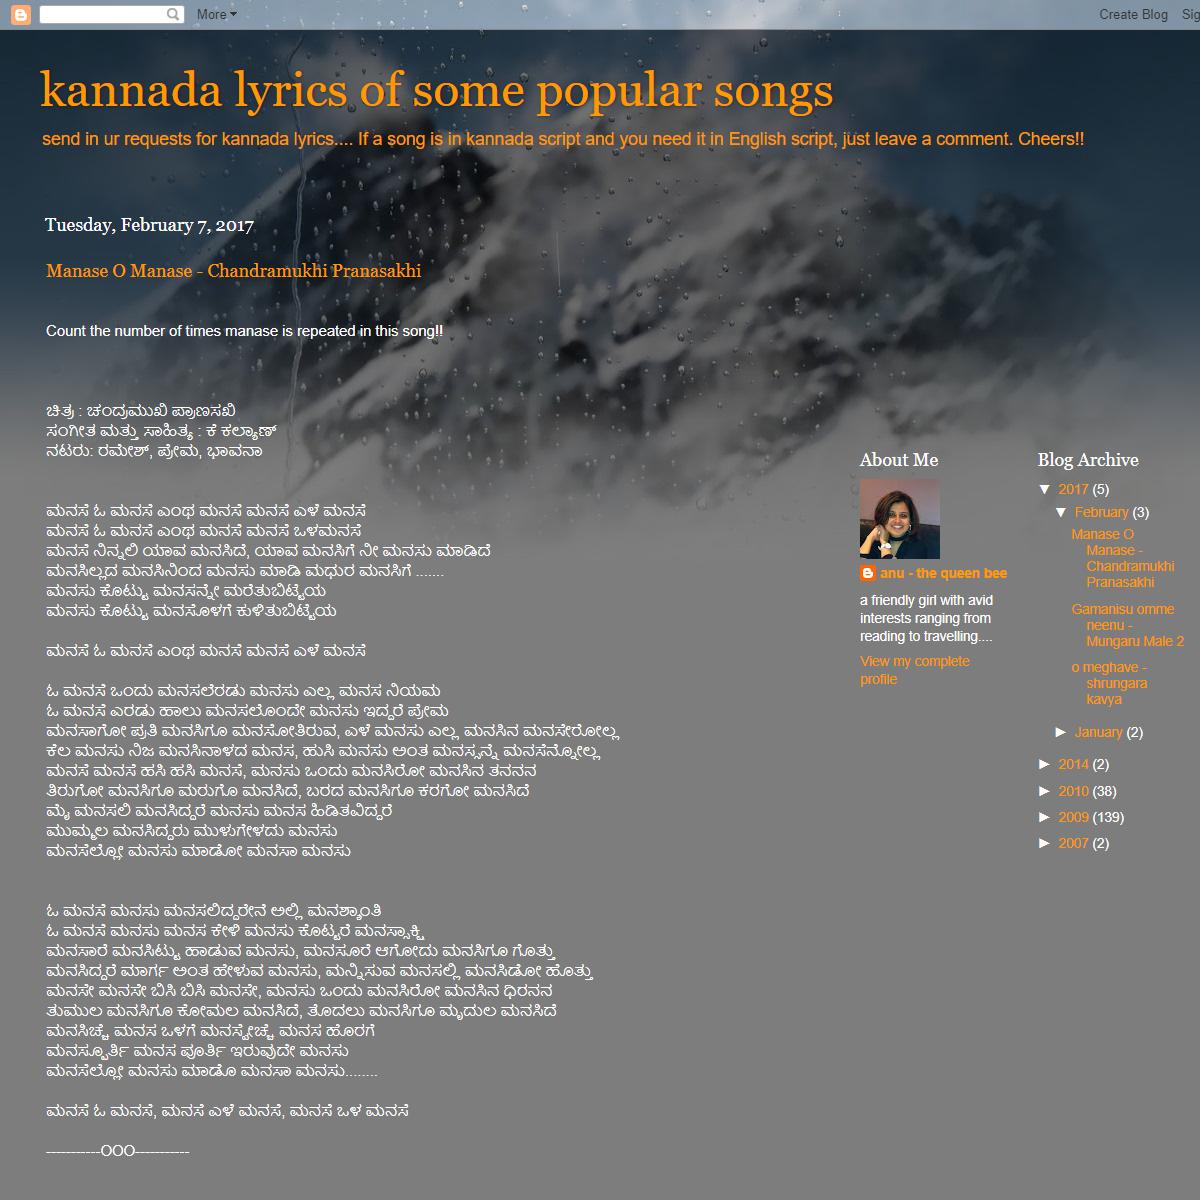 kannada lyrics of some popular songs- 2017